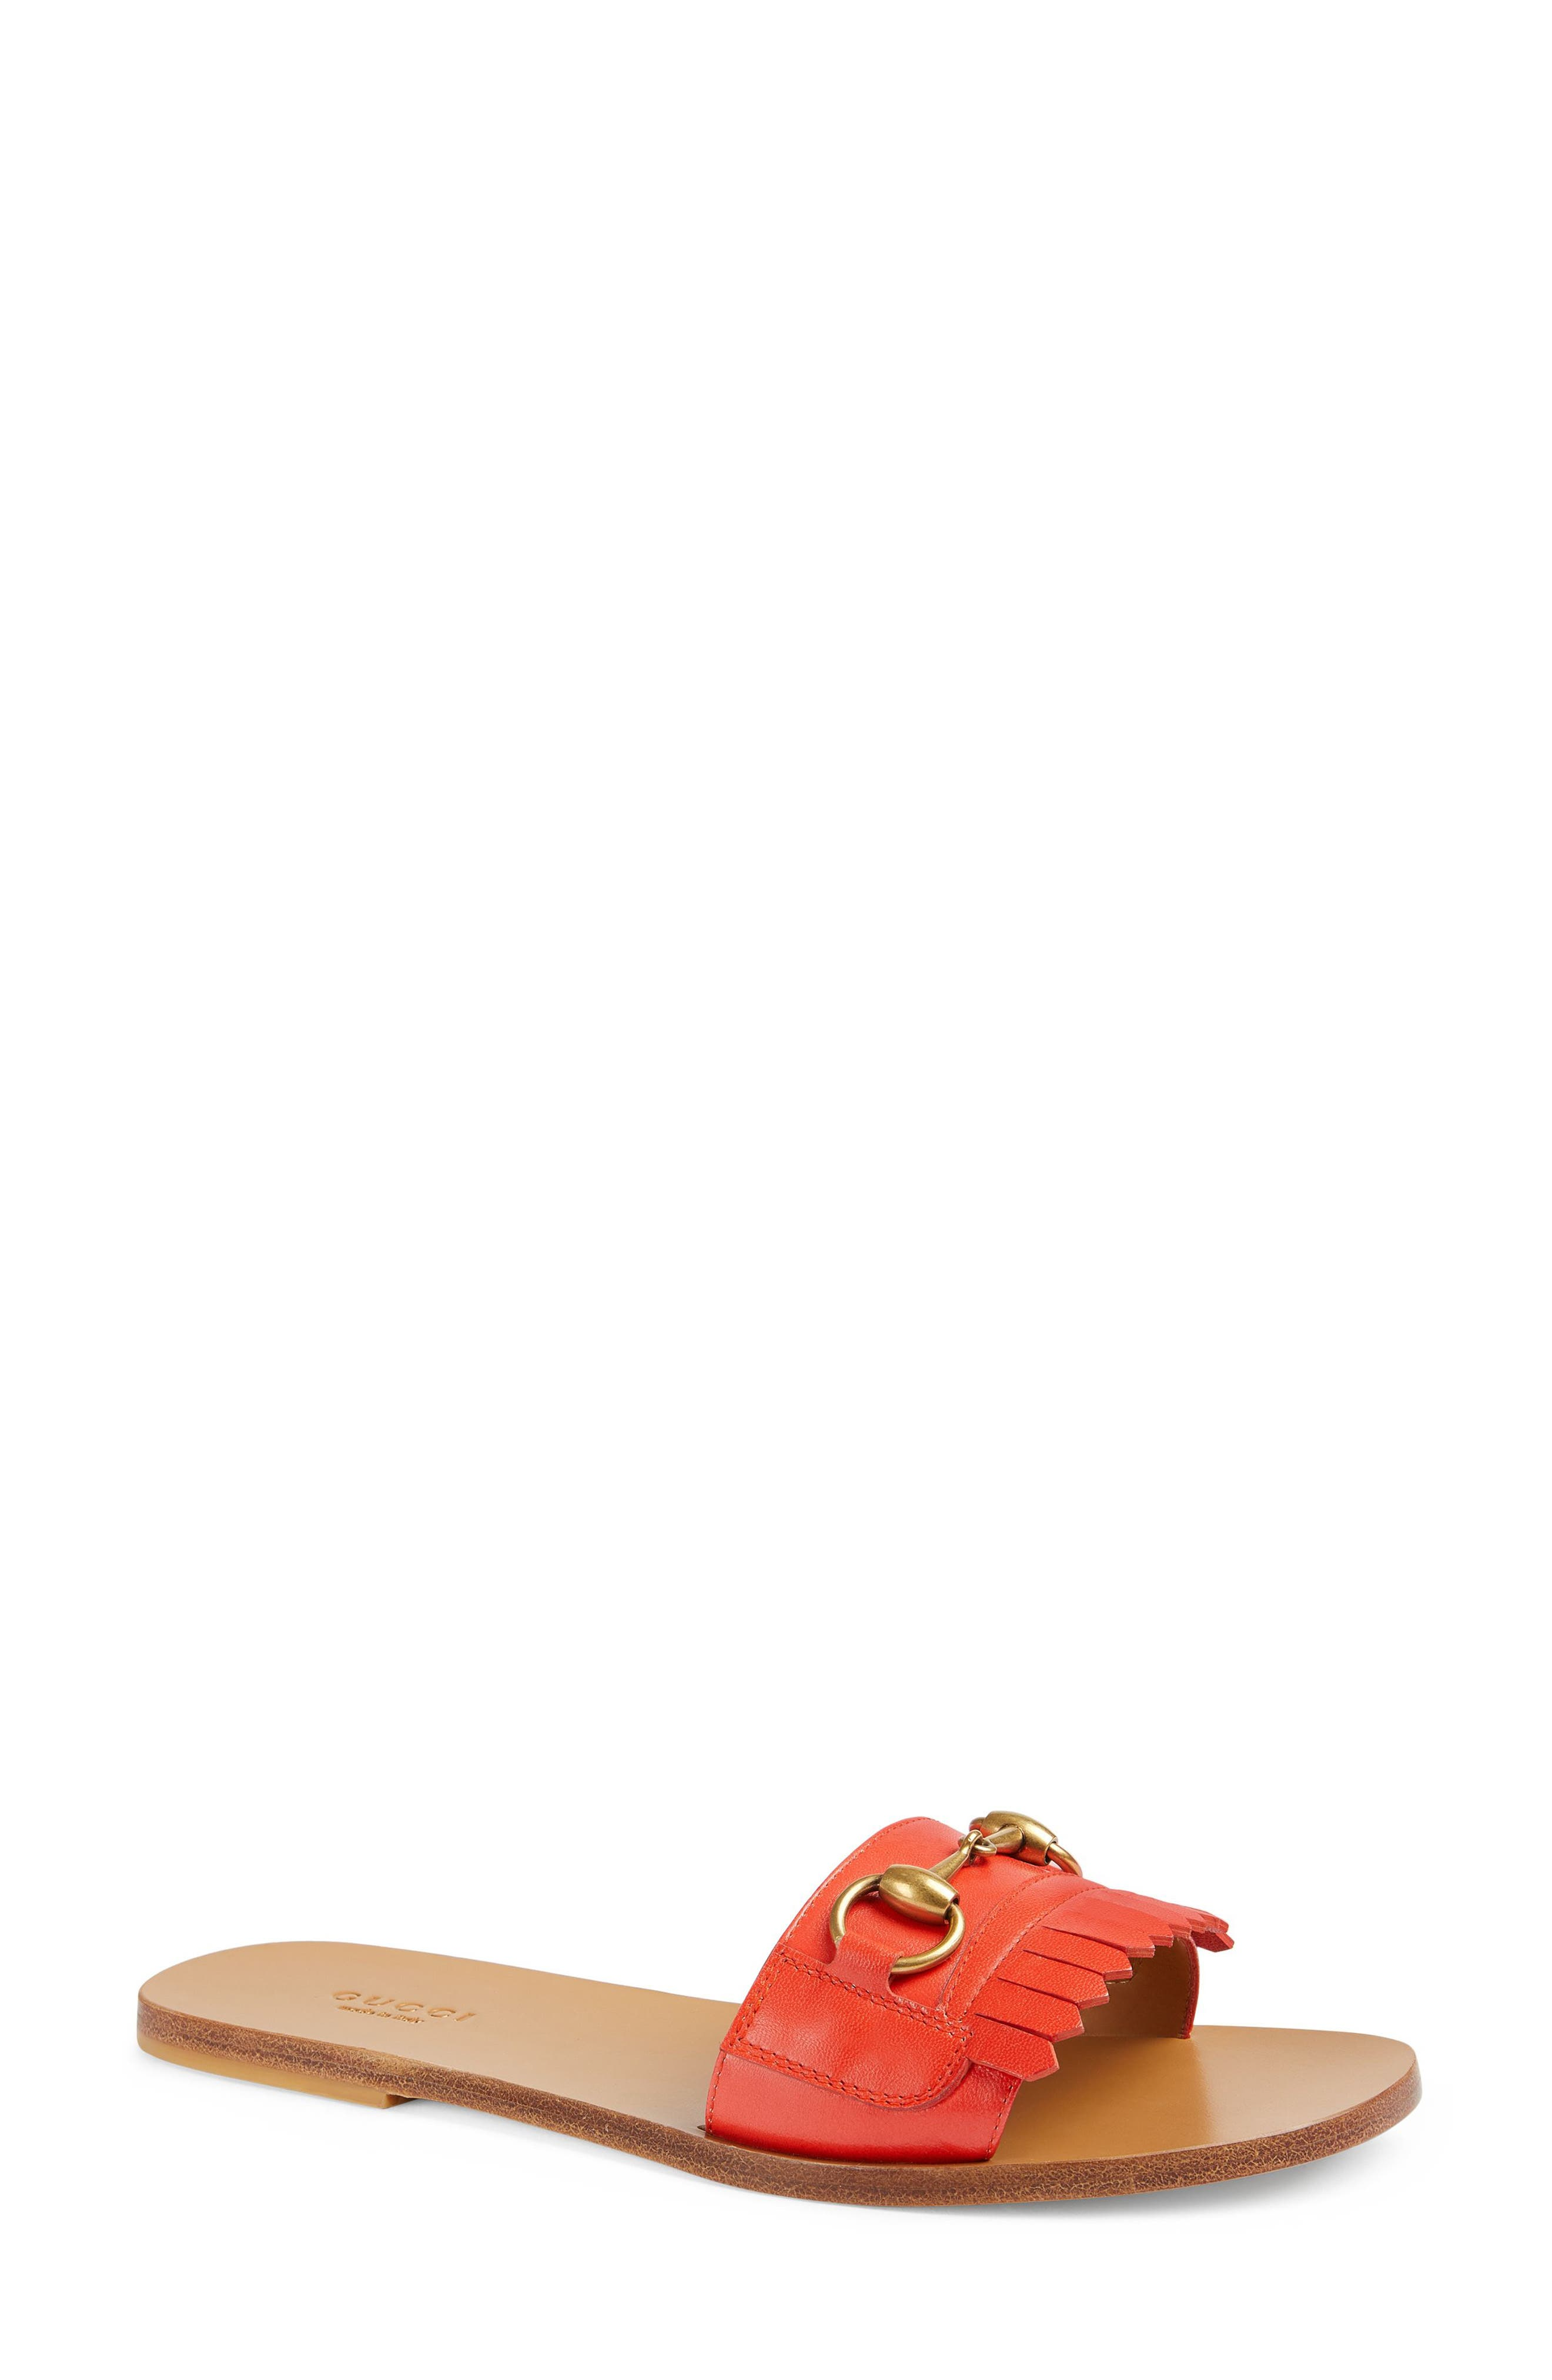 Varadero Slide Sandal,                             Main thumbnail 1, color,                             Orange